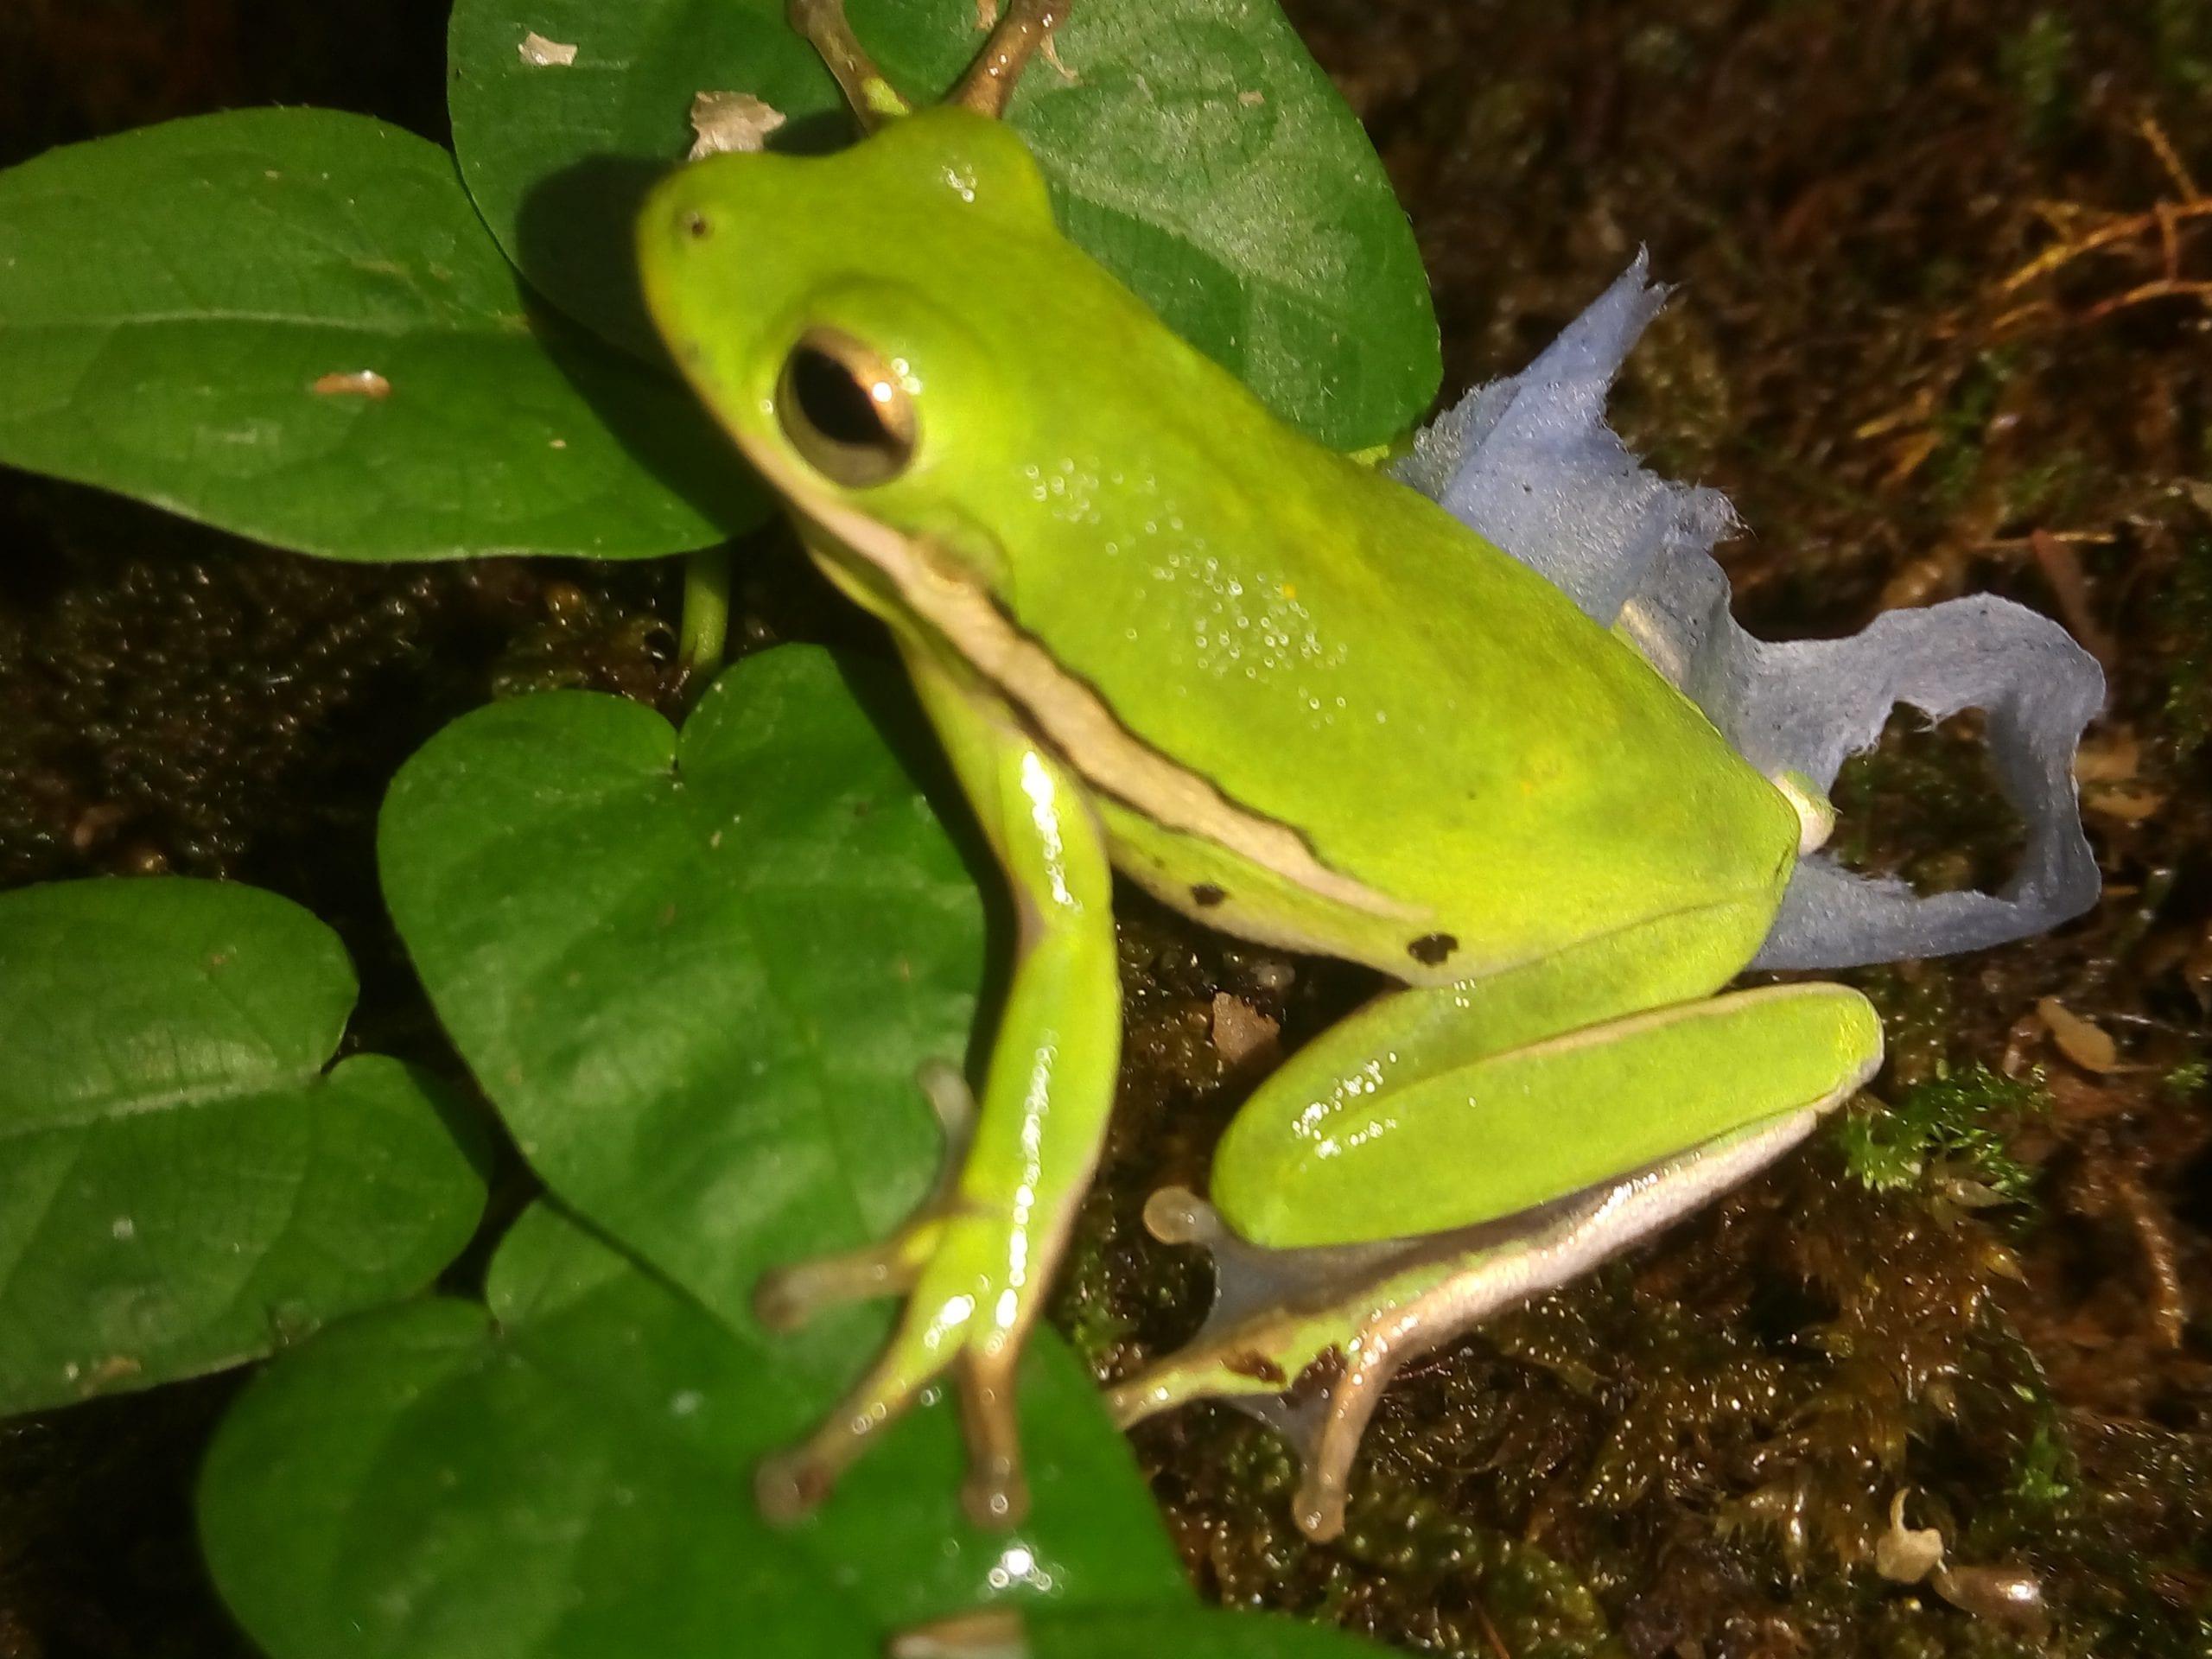 North American Green Tree Frog CB (Hyla cinerea) Image